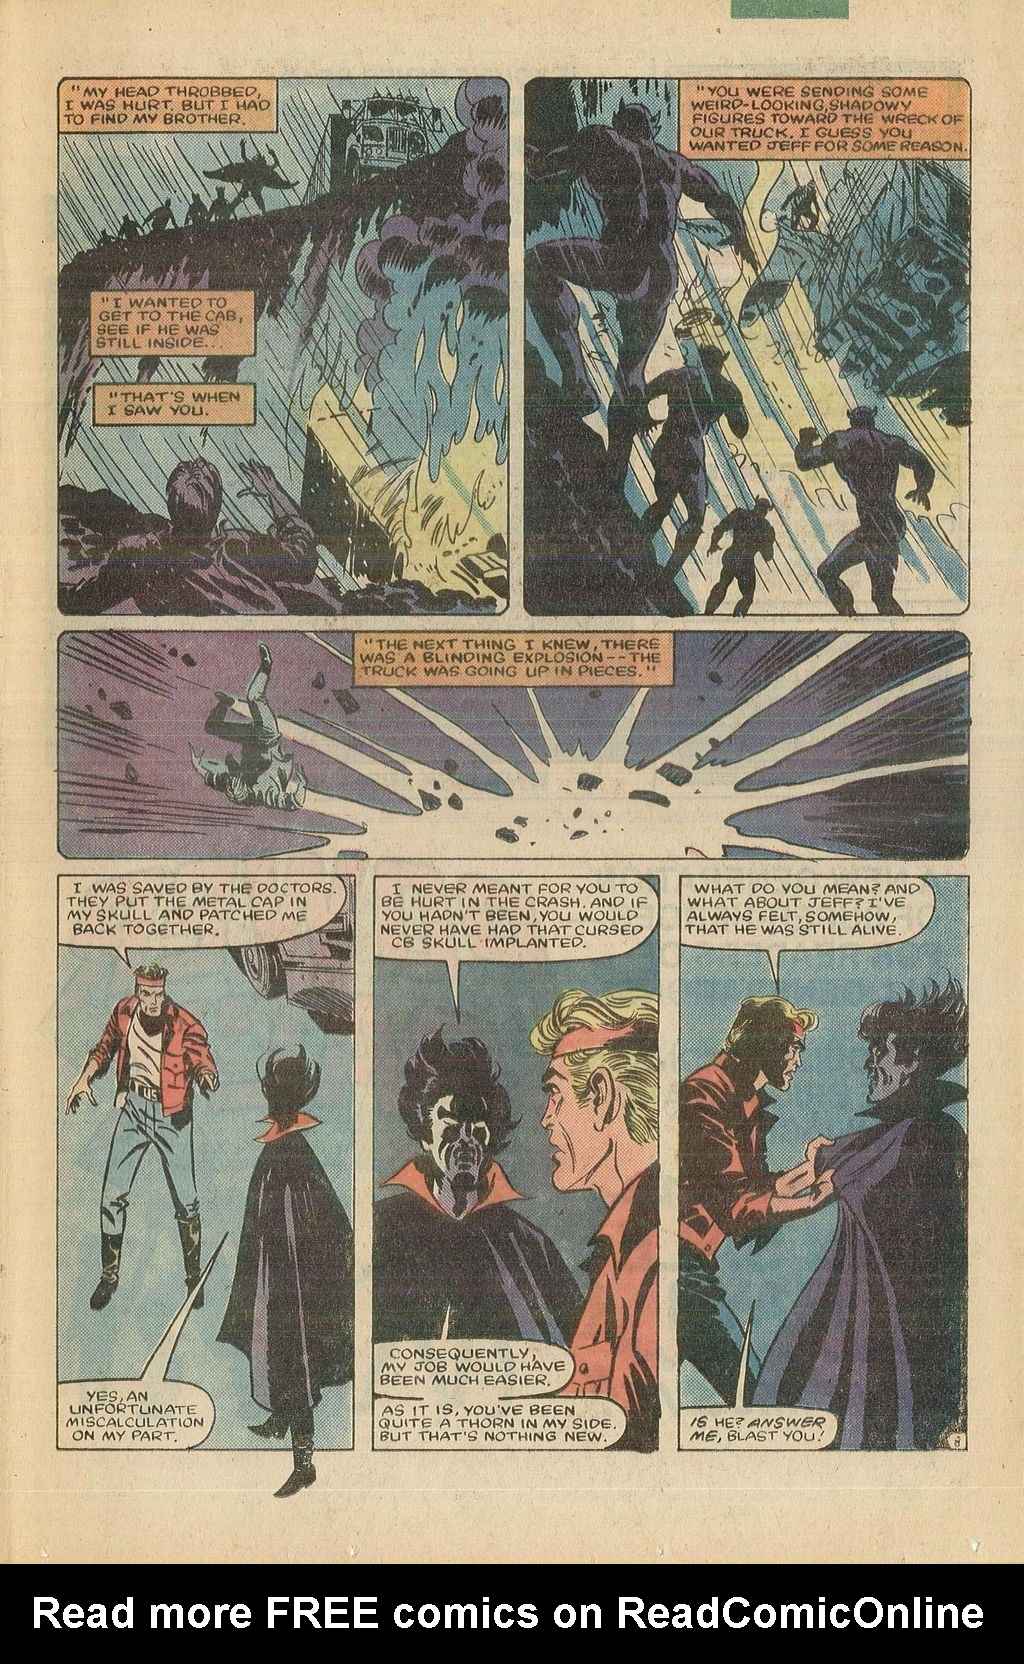 Read online U.S. 1 comic -  Issue #10 - 13